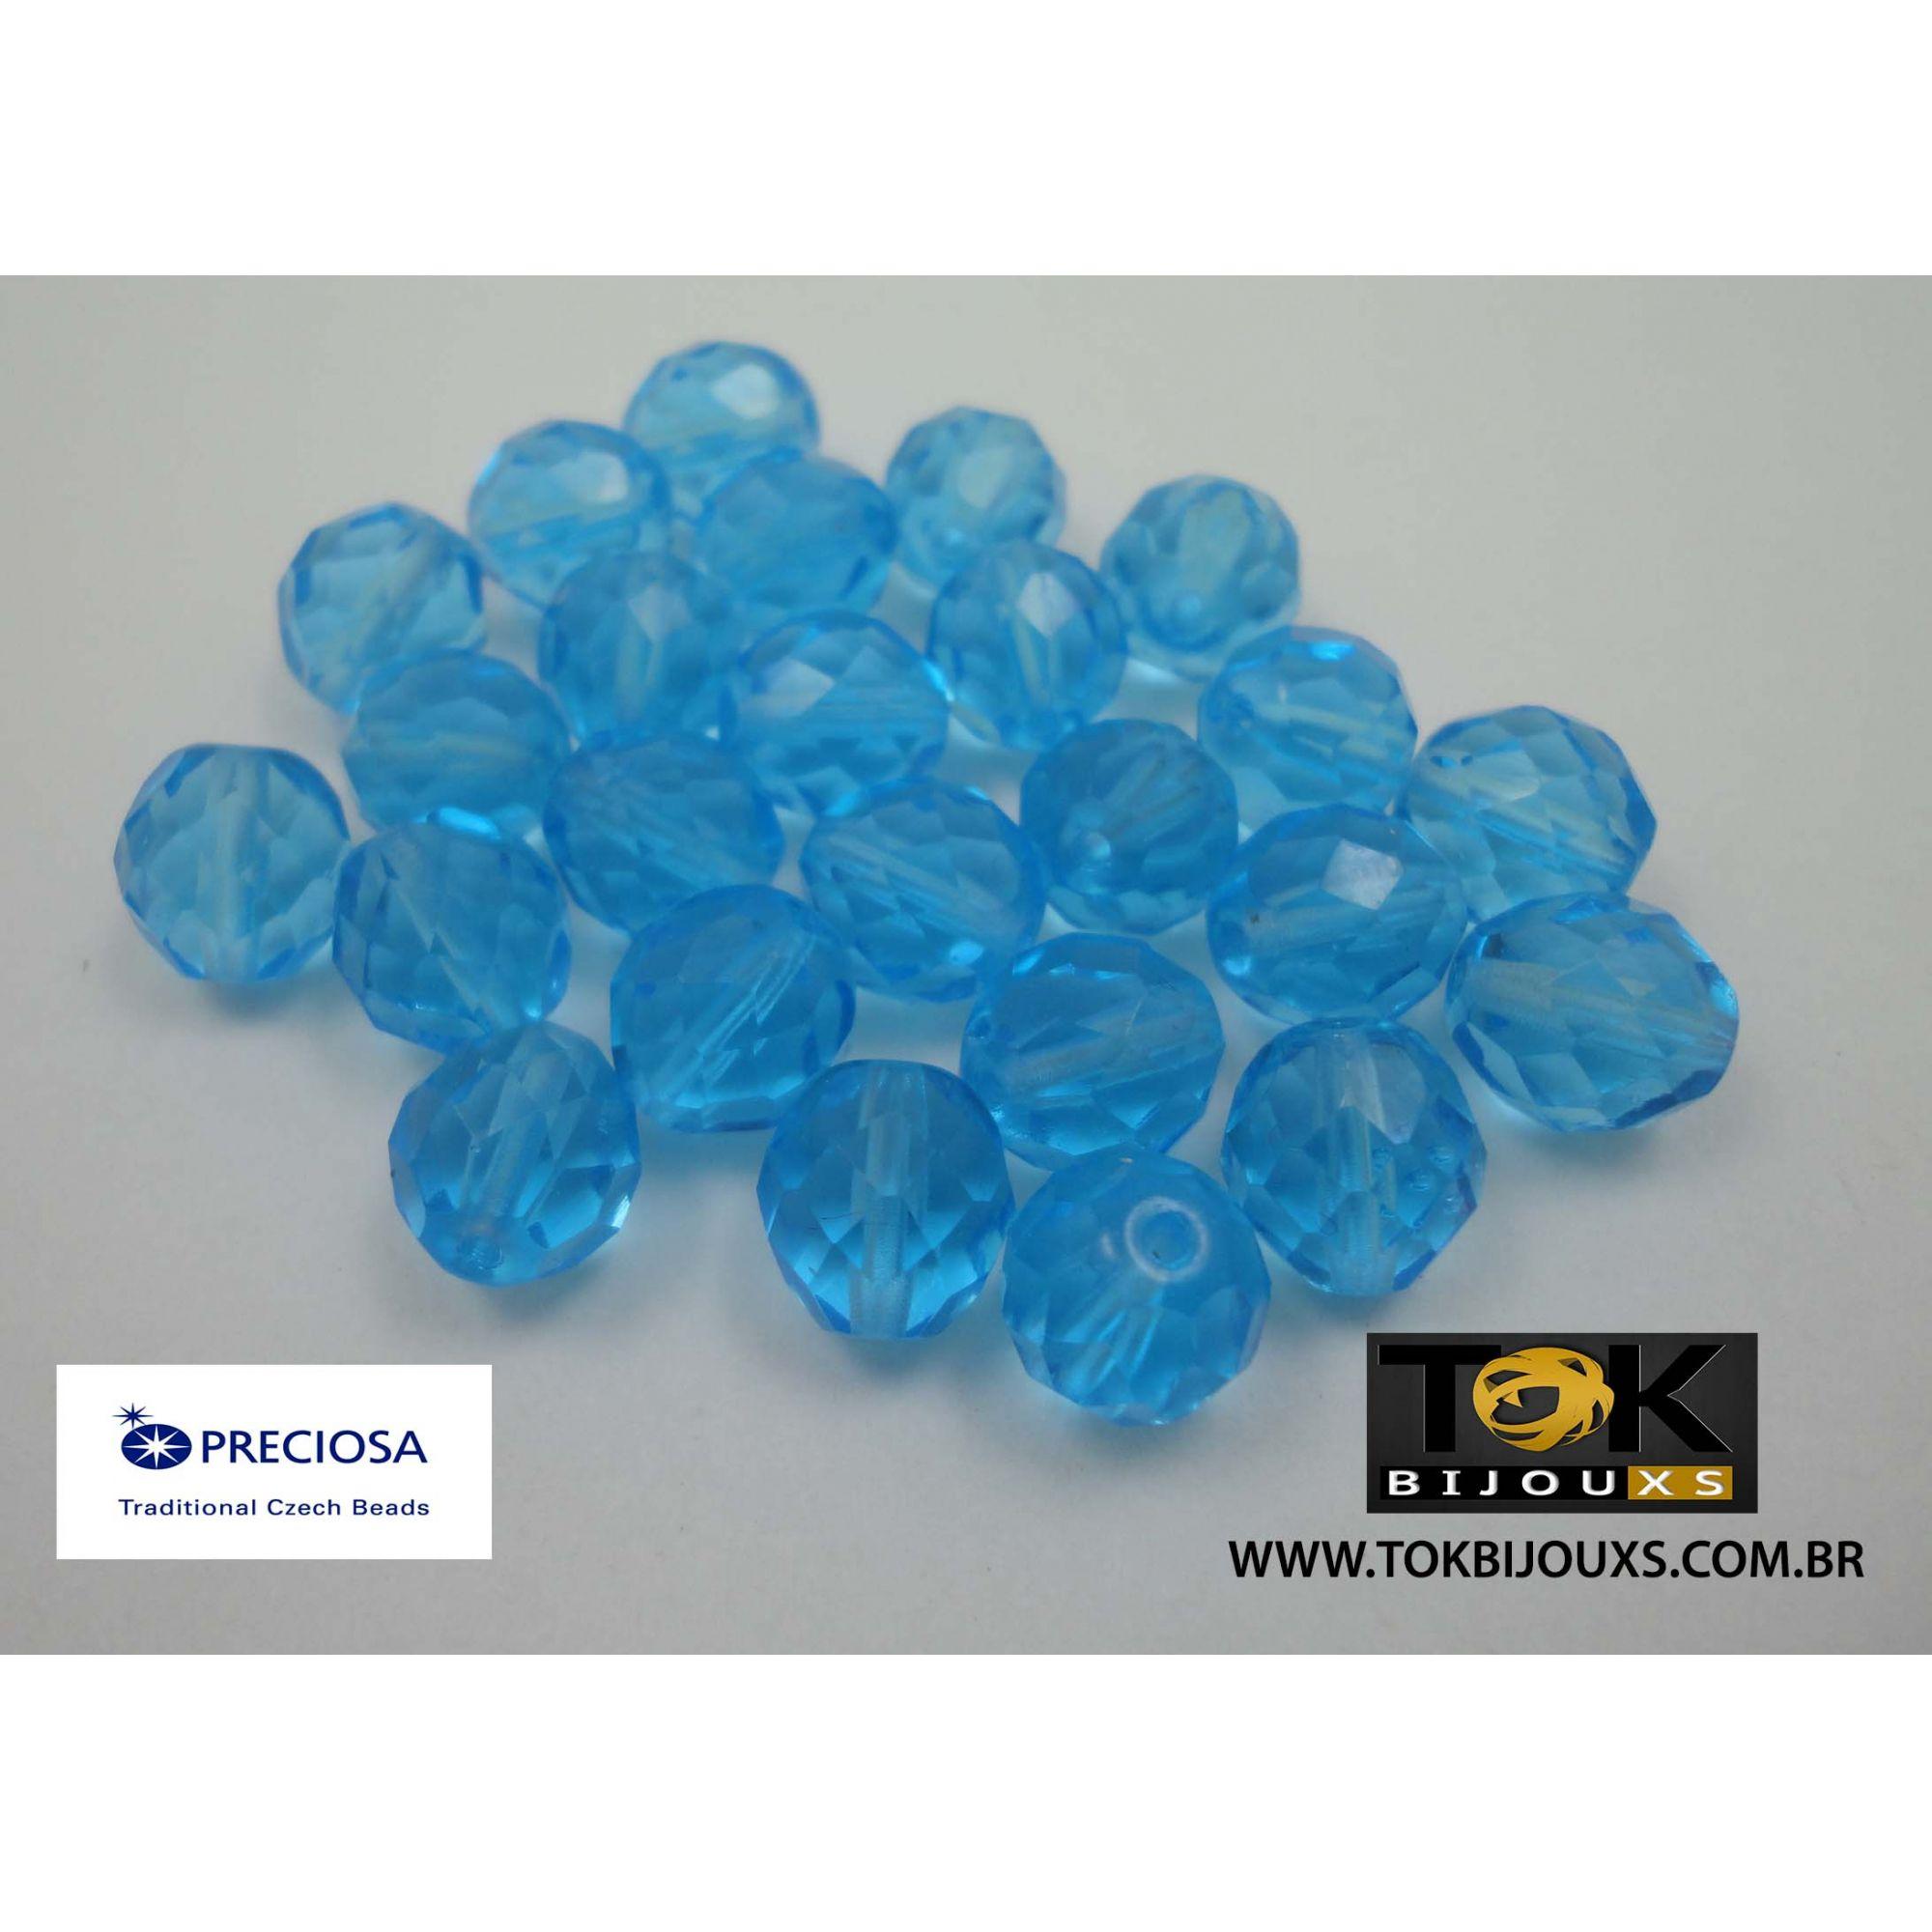 Cristal Jablonex/Preciosa® - Azul Claro Transparente 8mm - 25  Unid